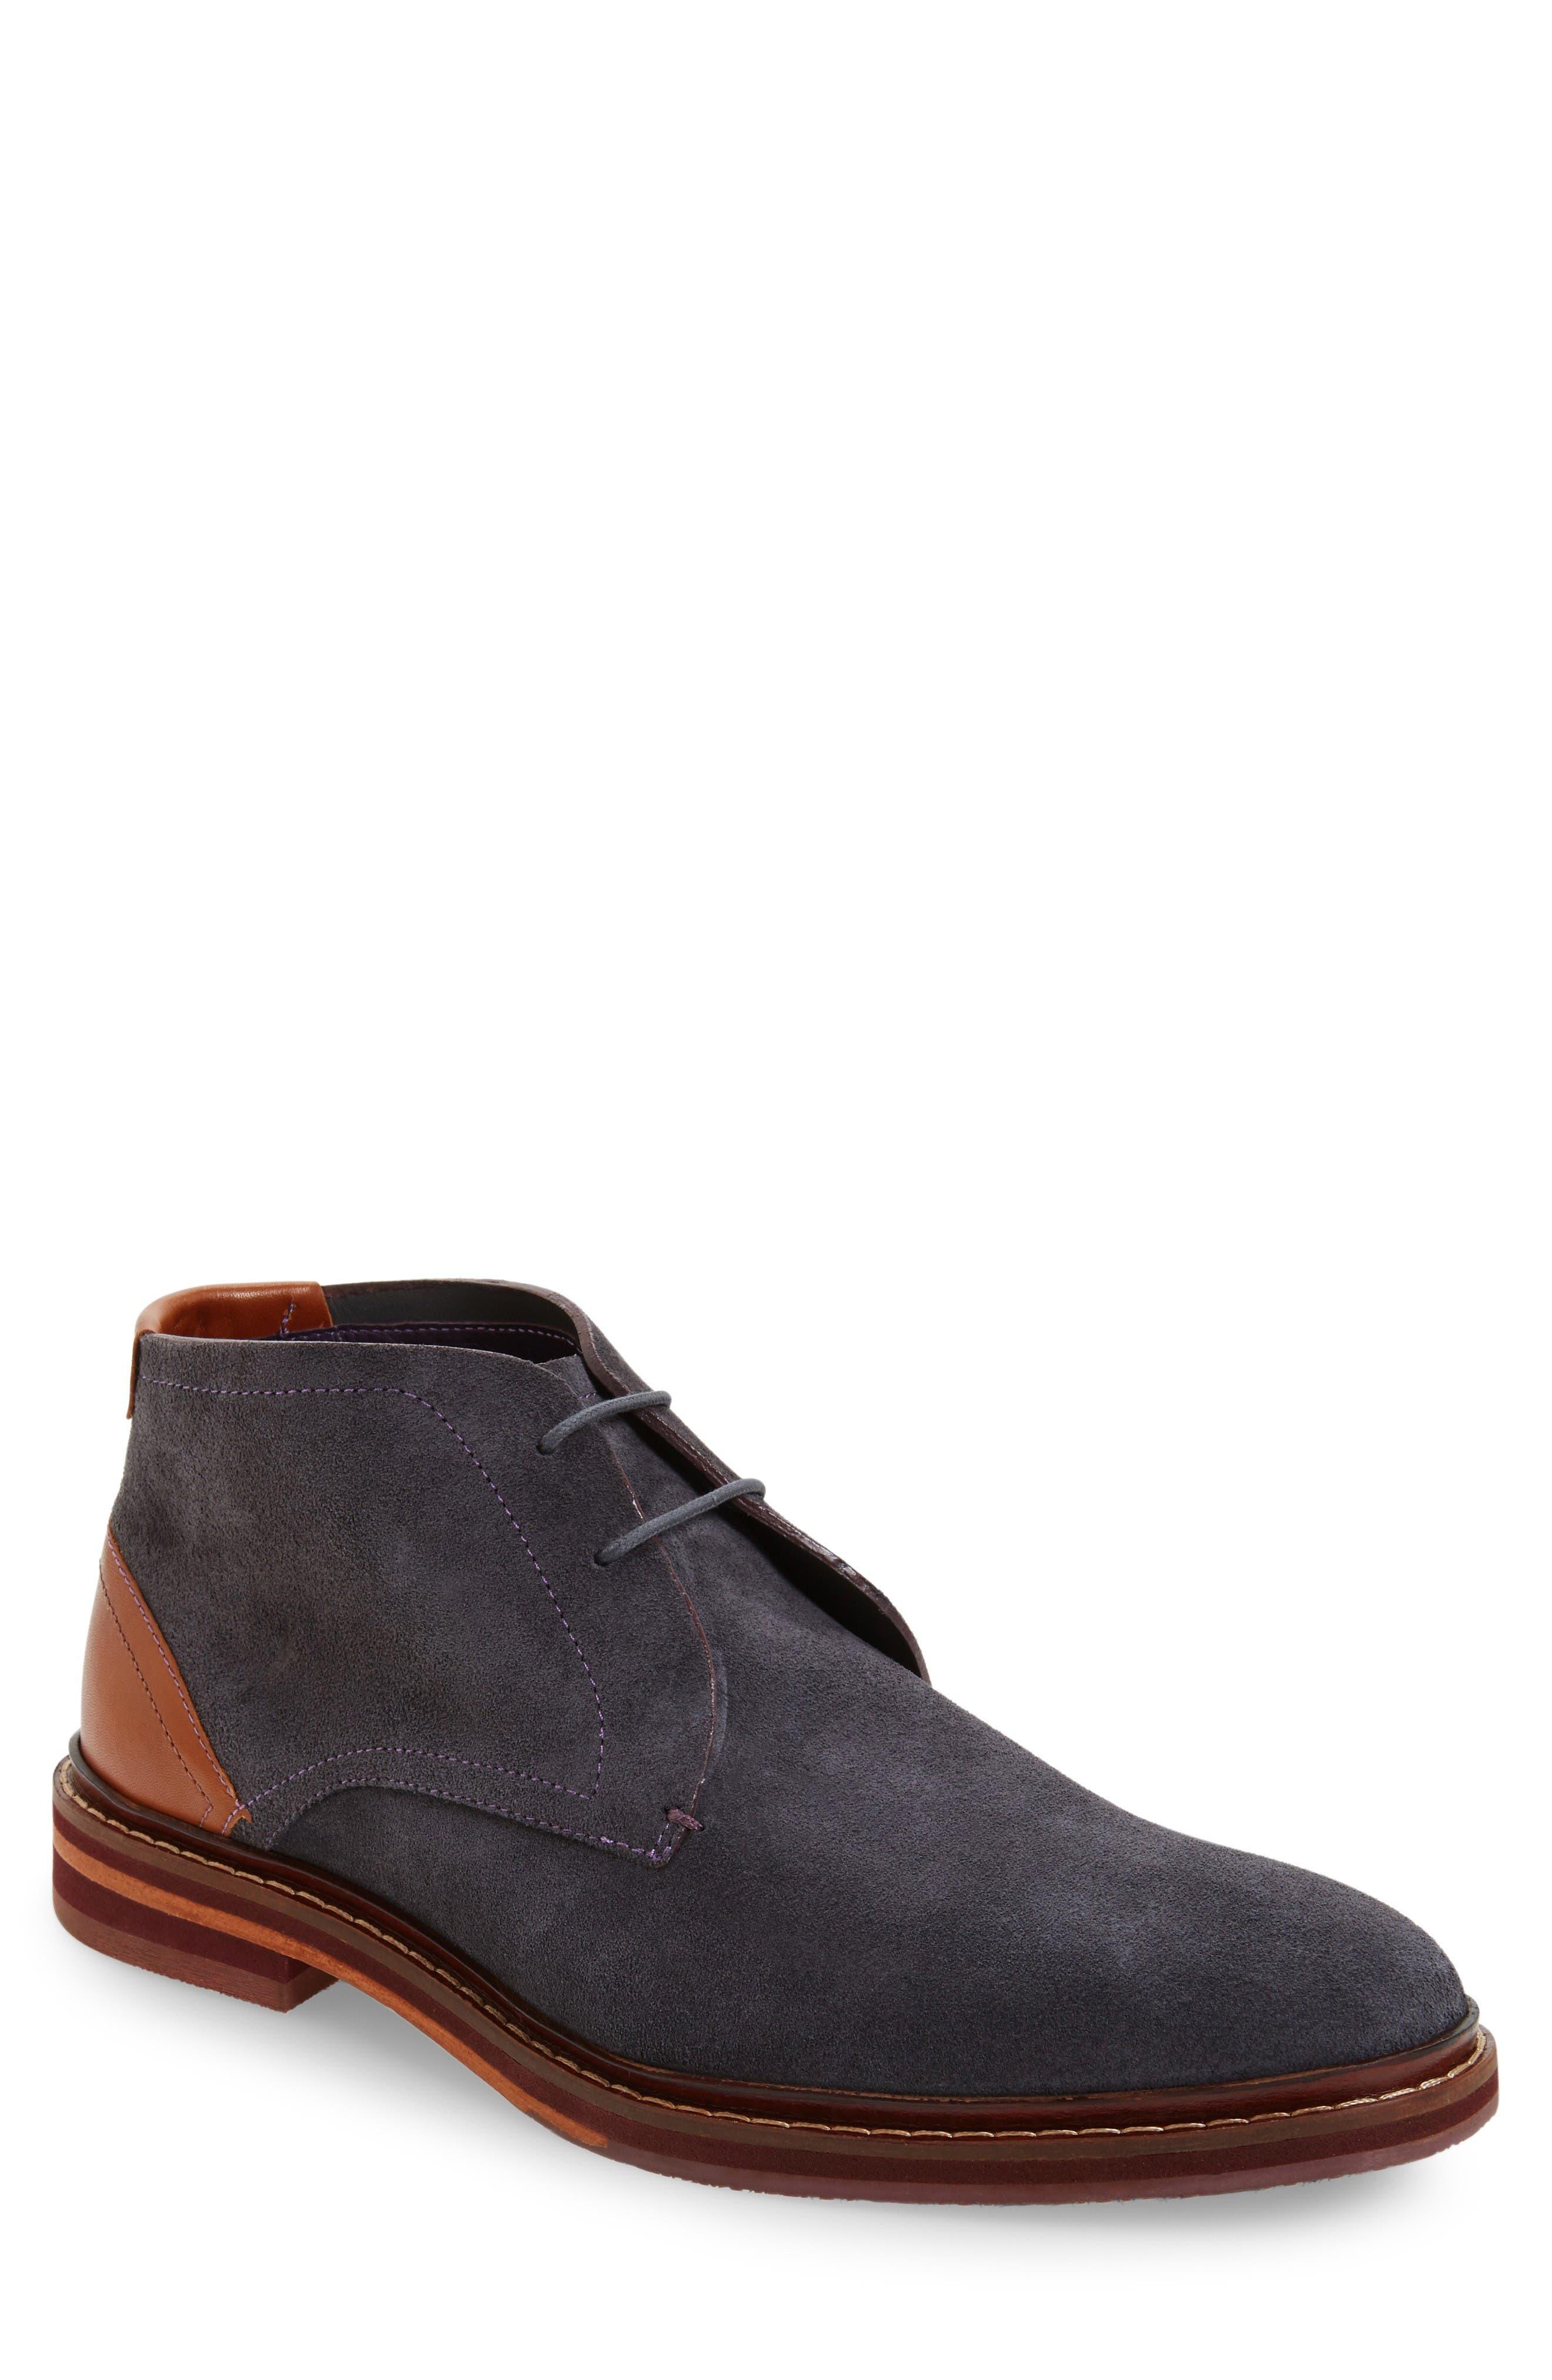 Azzlan Chukka Boot,                         Main,                         color, Grey Suede